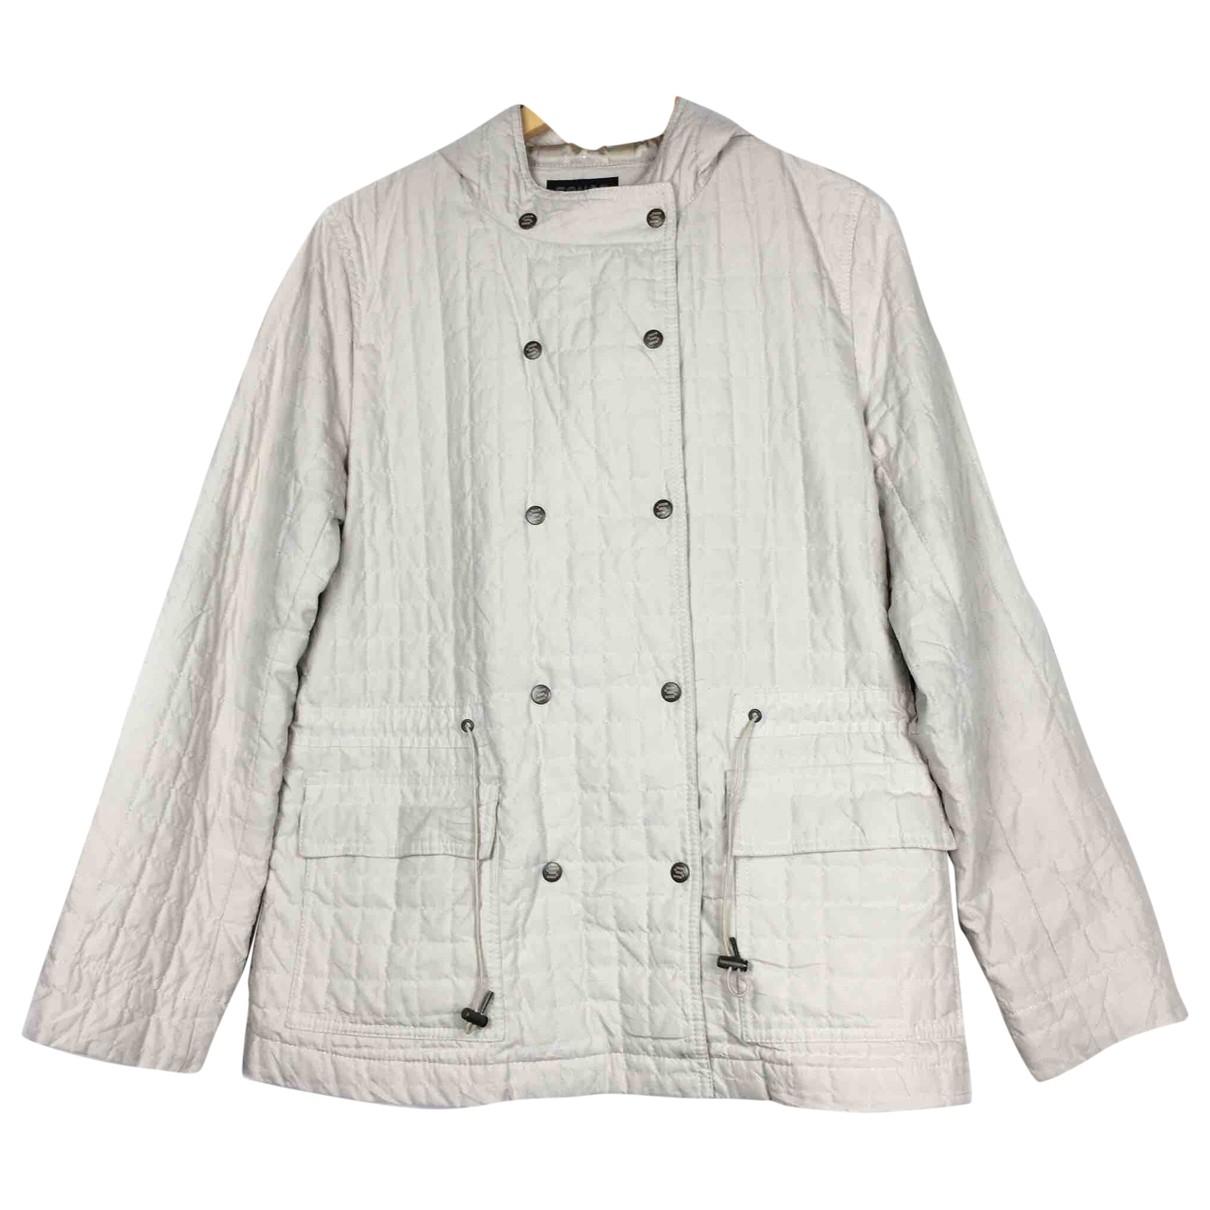 Sonia By Sonia Rykiel \N Beige jacket for Women 40 FR